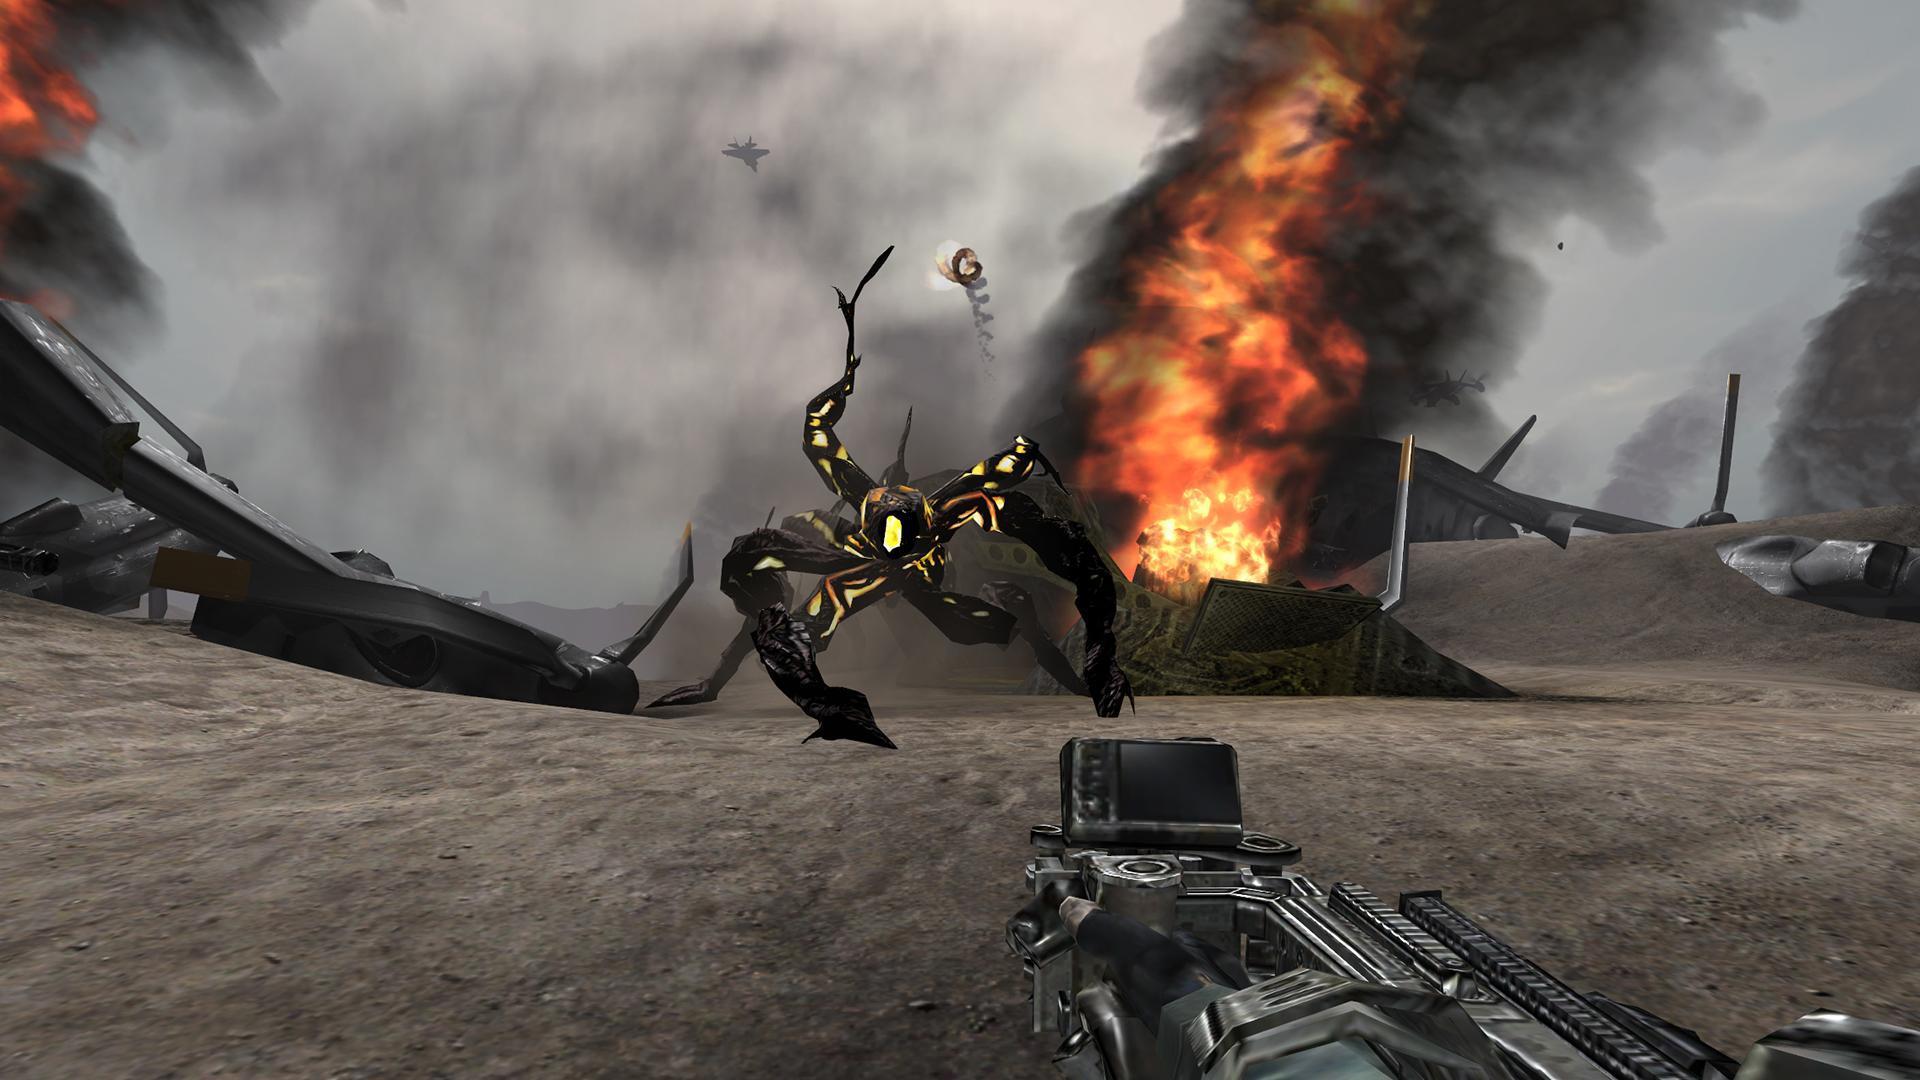 Edge of Tomorrow Game screenshot #1